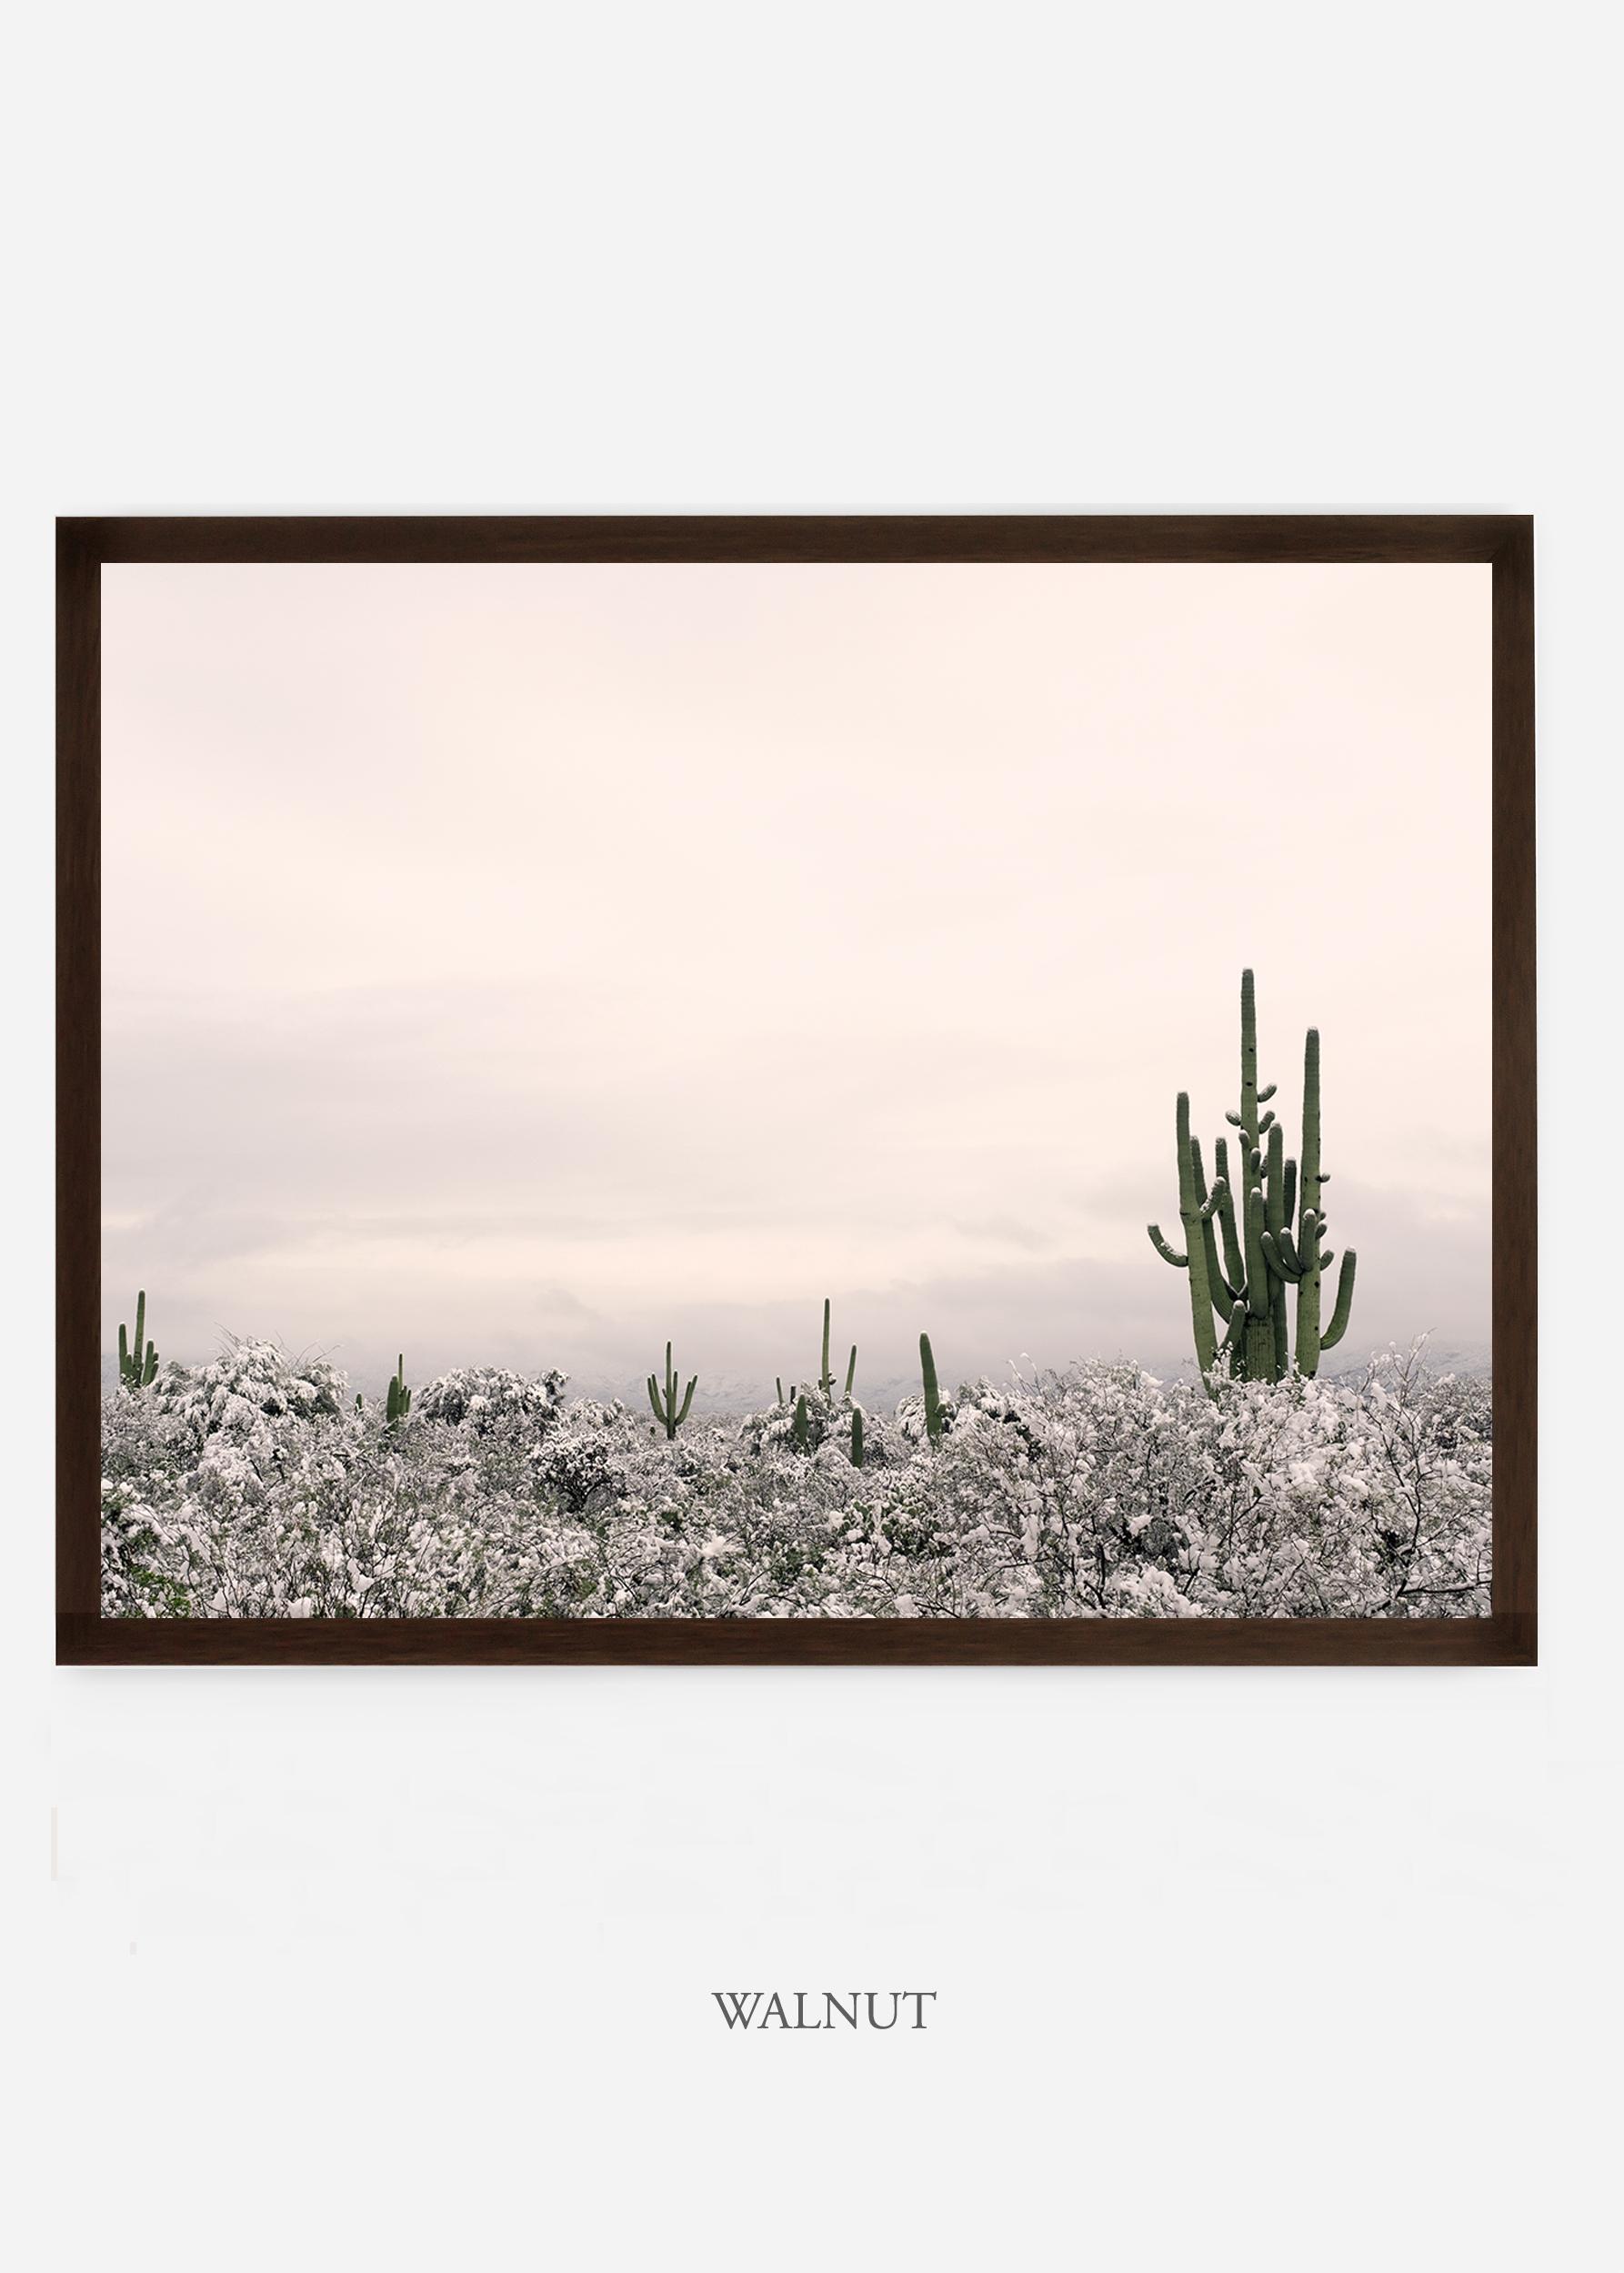 nomat_walnutframe-saguaroNo.7-wildercalifornia-art-wallart-cactusprint-homedecor-prints-arizona-botanical-artwork-interiordesign.jpg